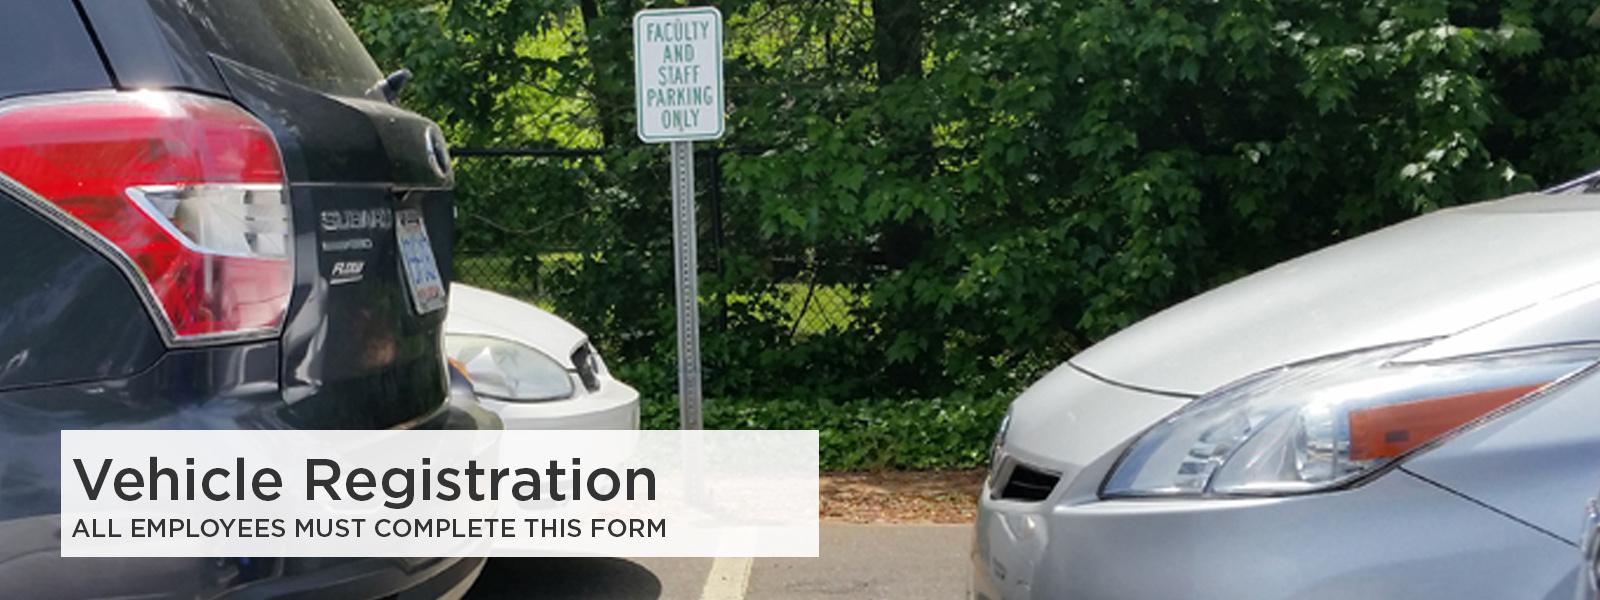 Employee Vehicle Registrarion